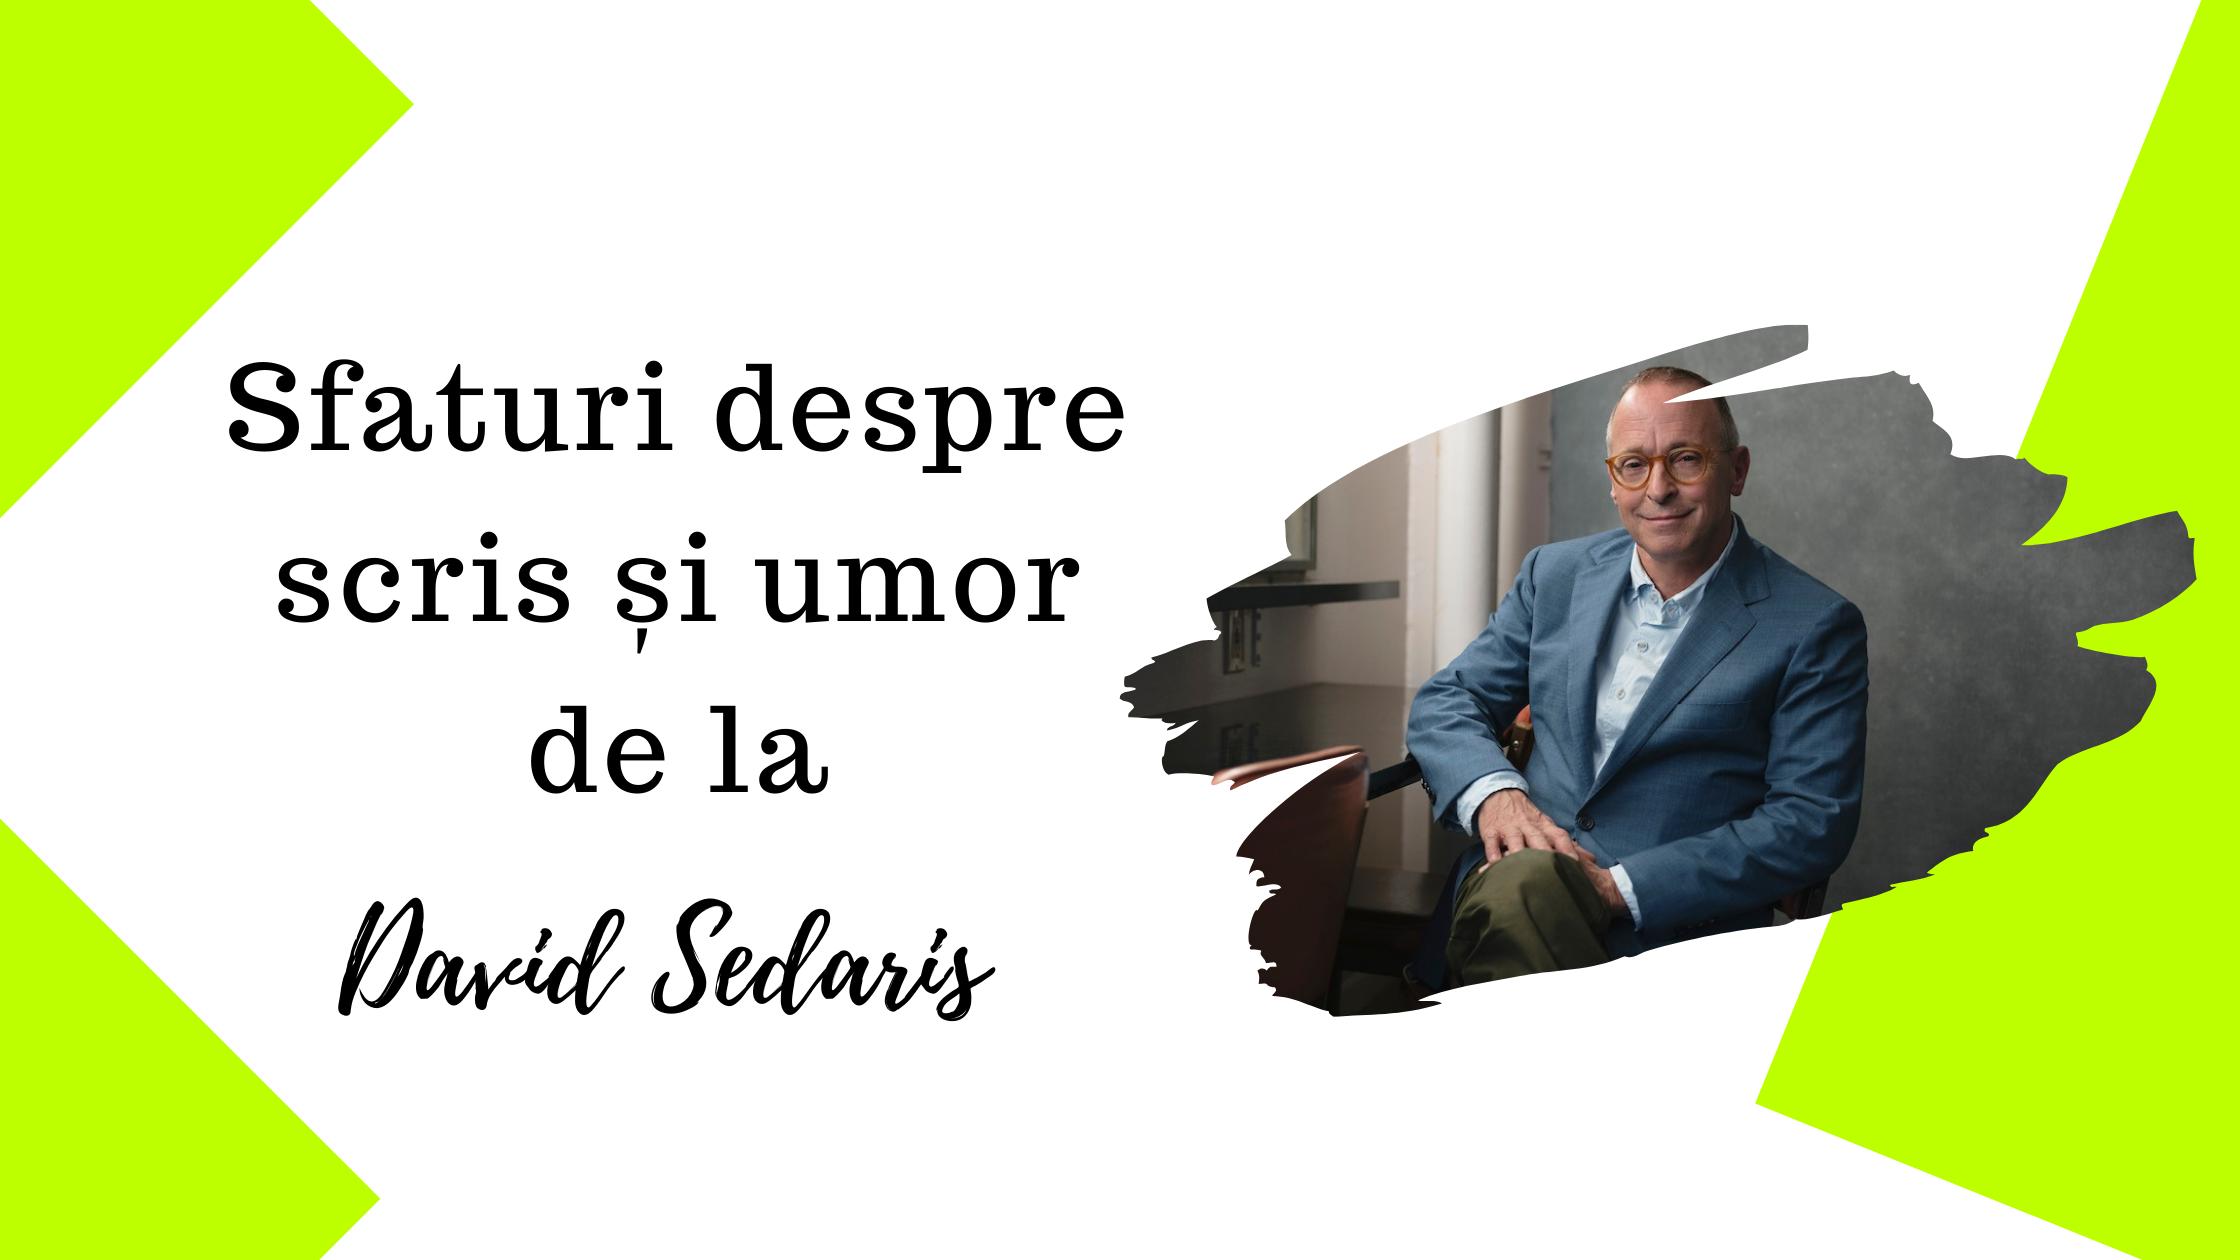 Sfaturi despre scris și umor de la David Sedaris